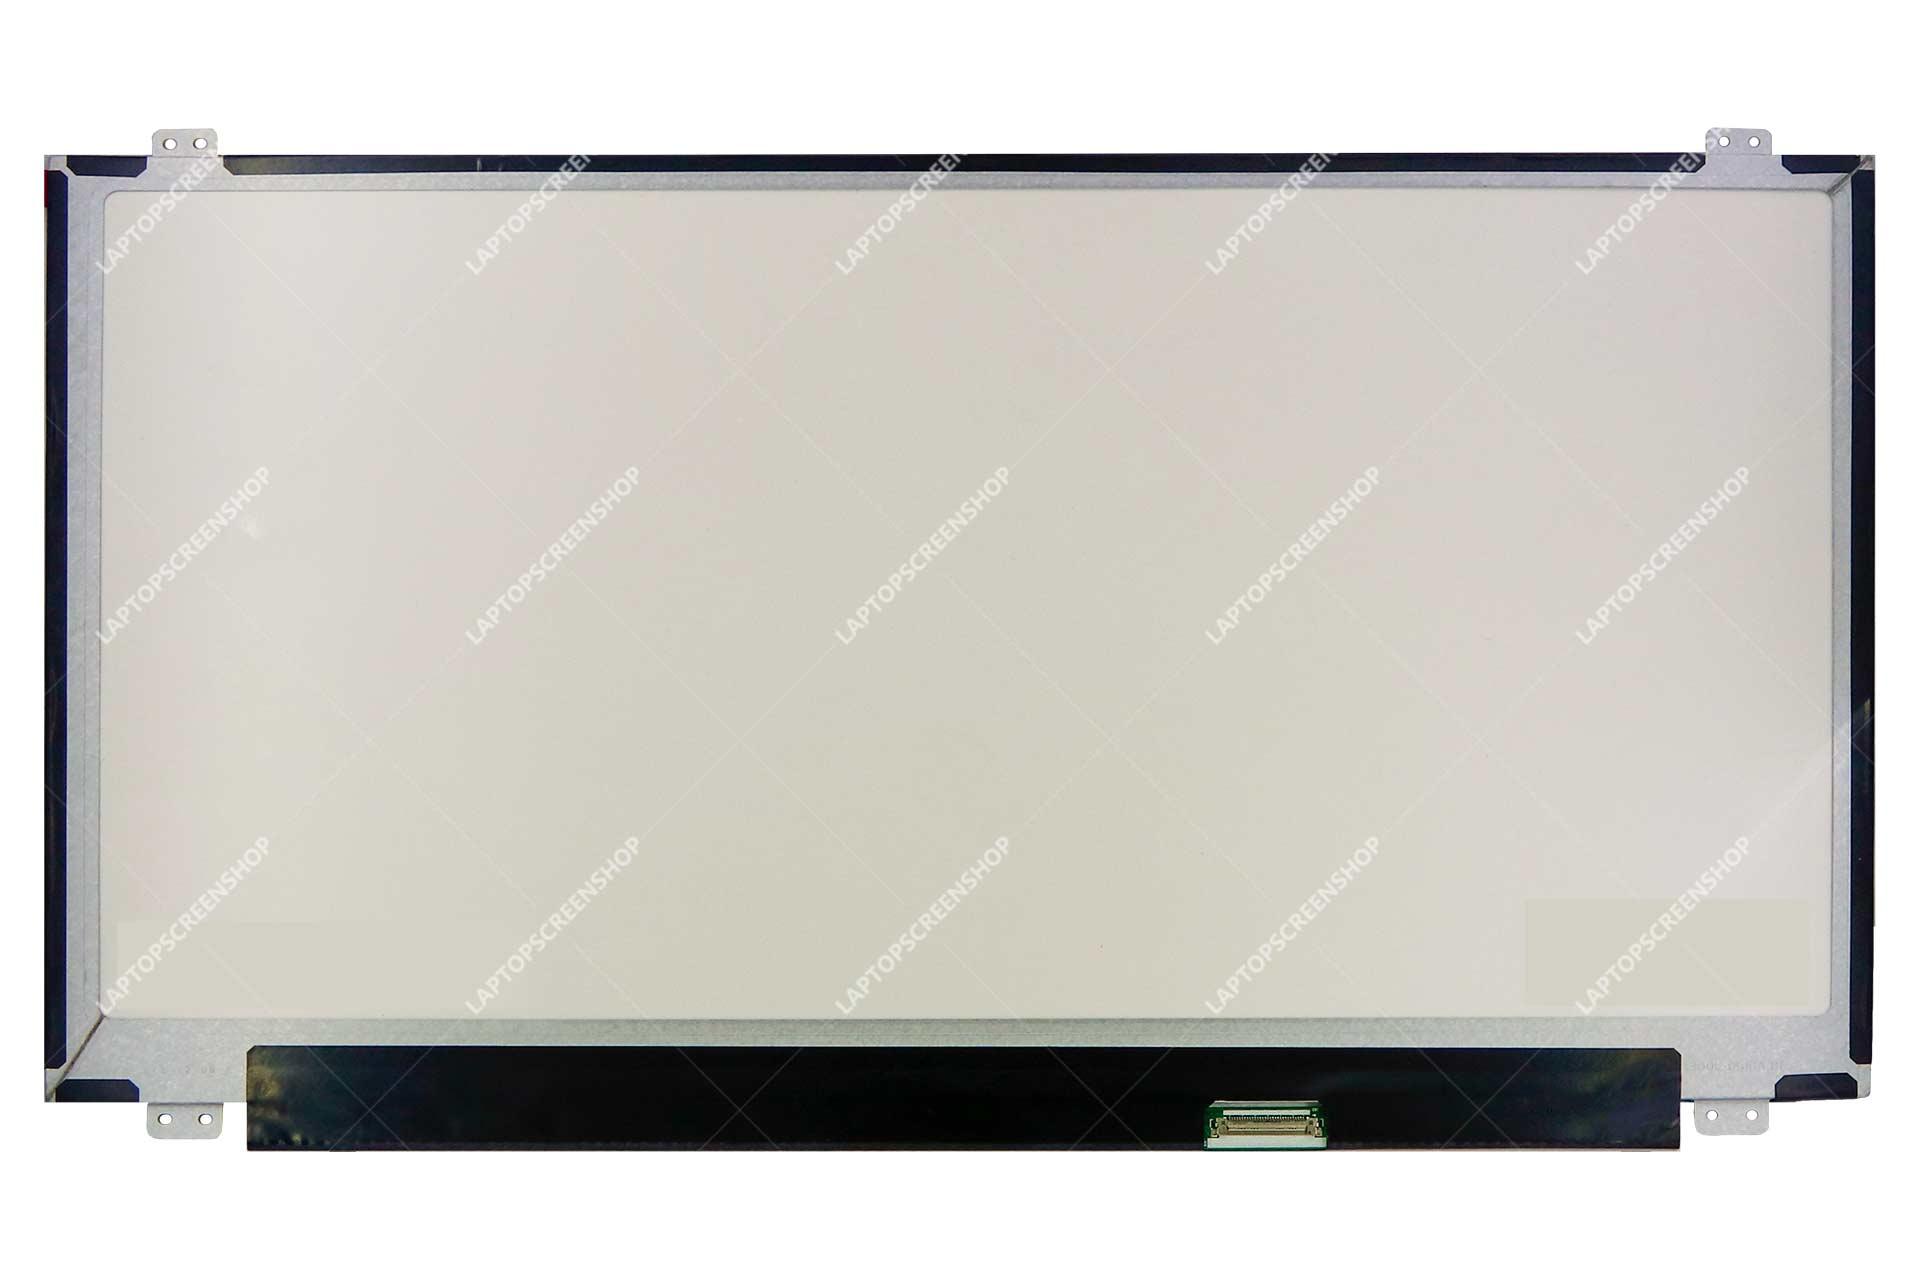 ACER-ASPIRE-E1-522-3884-LCD  HD فروشگاه لپ تاپ اسکرين   تعمير لپ تاپ